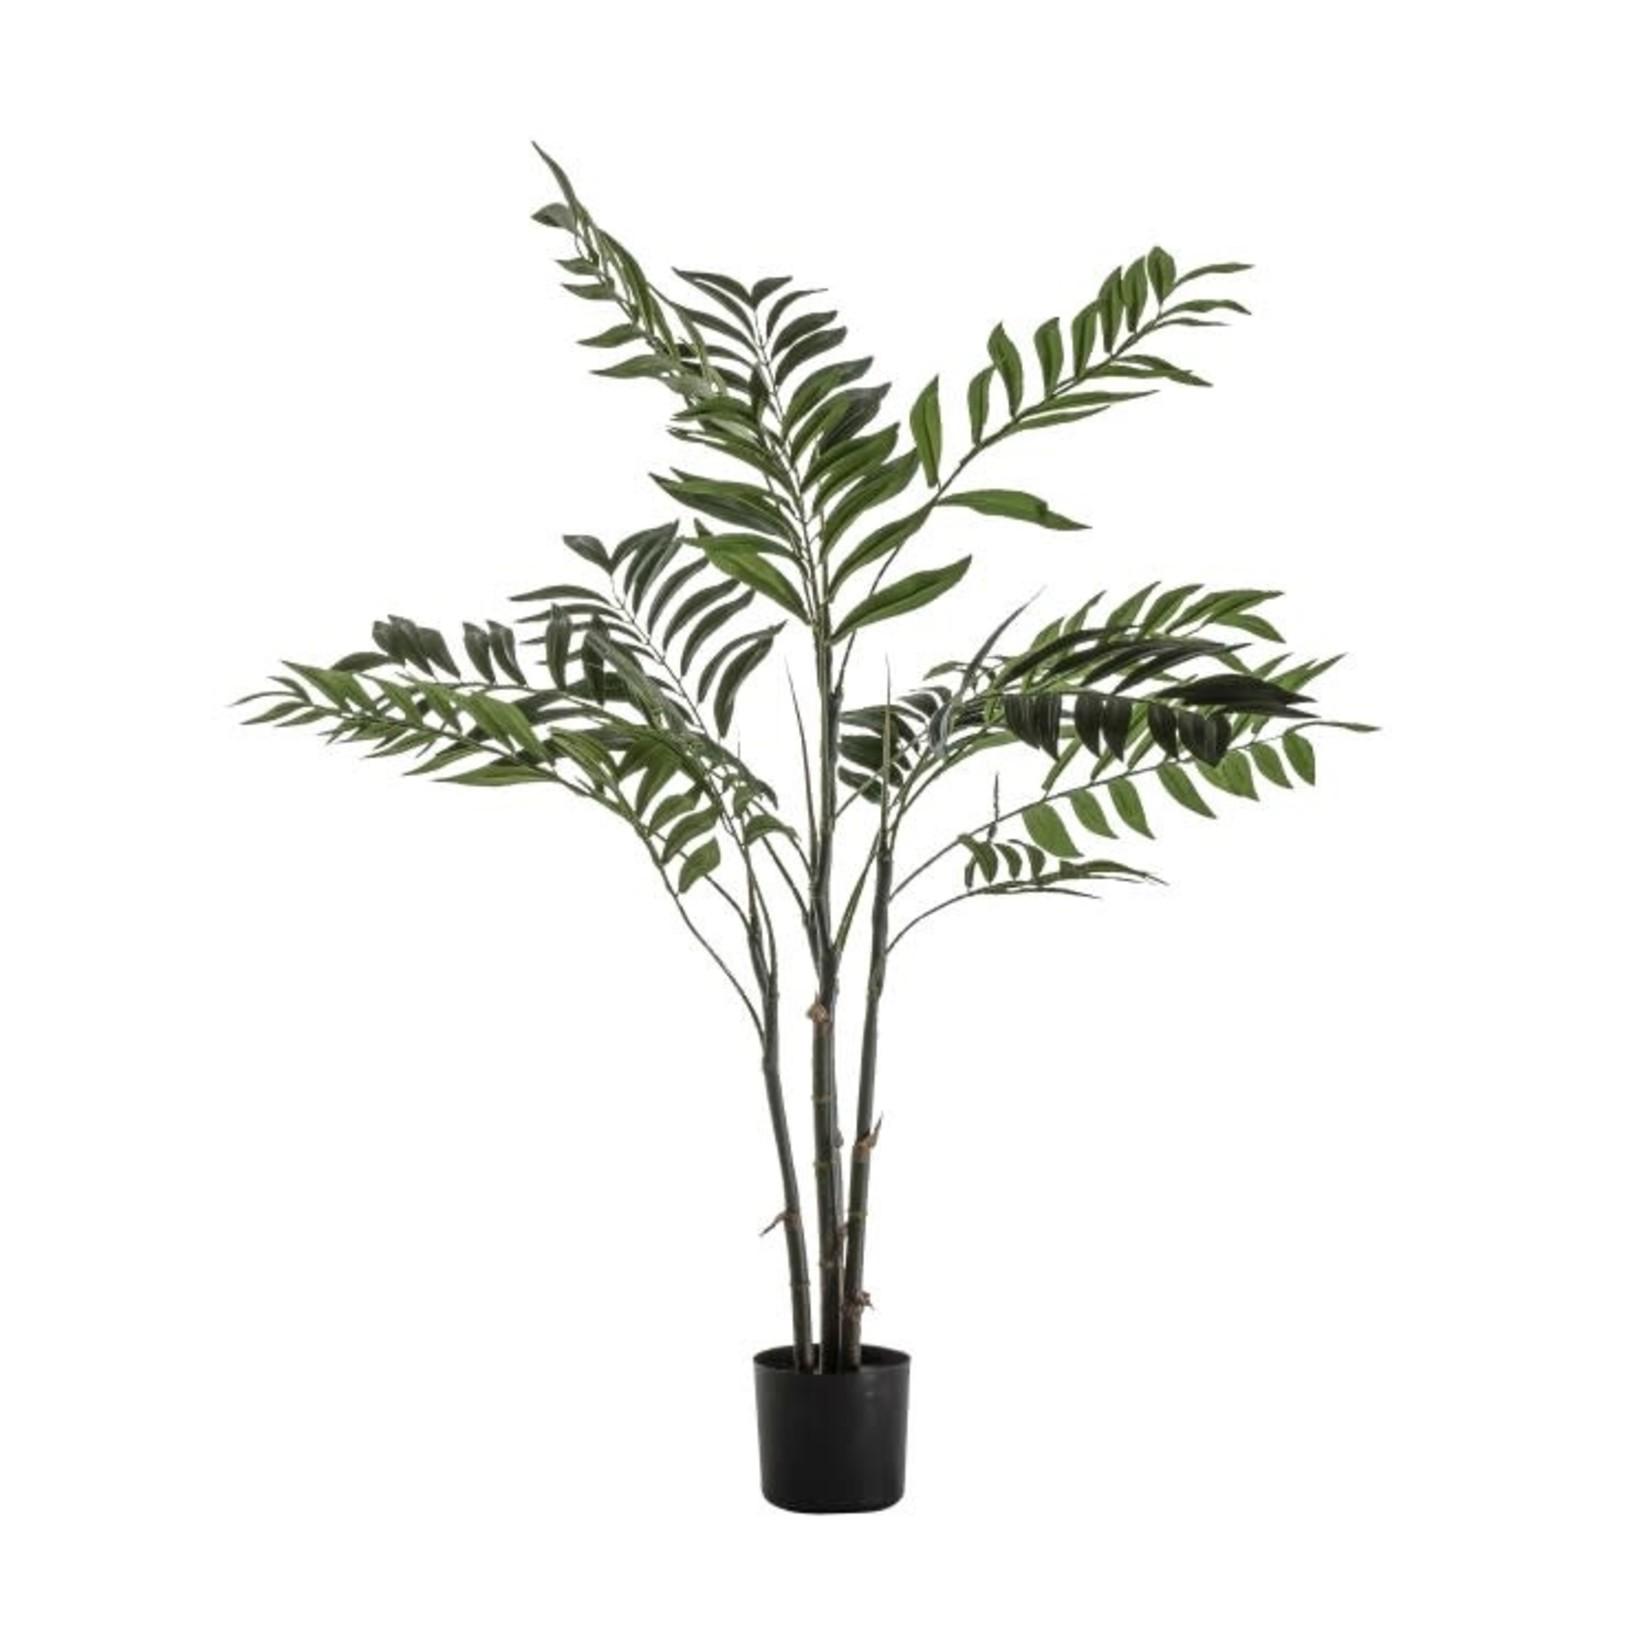 GD Areca Palm Tree Small